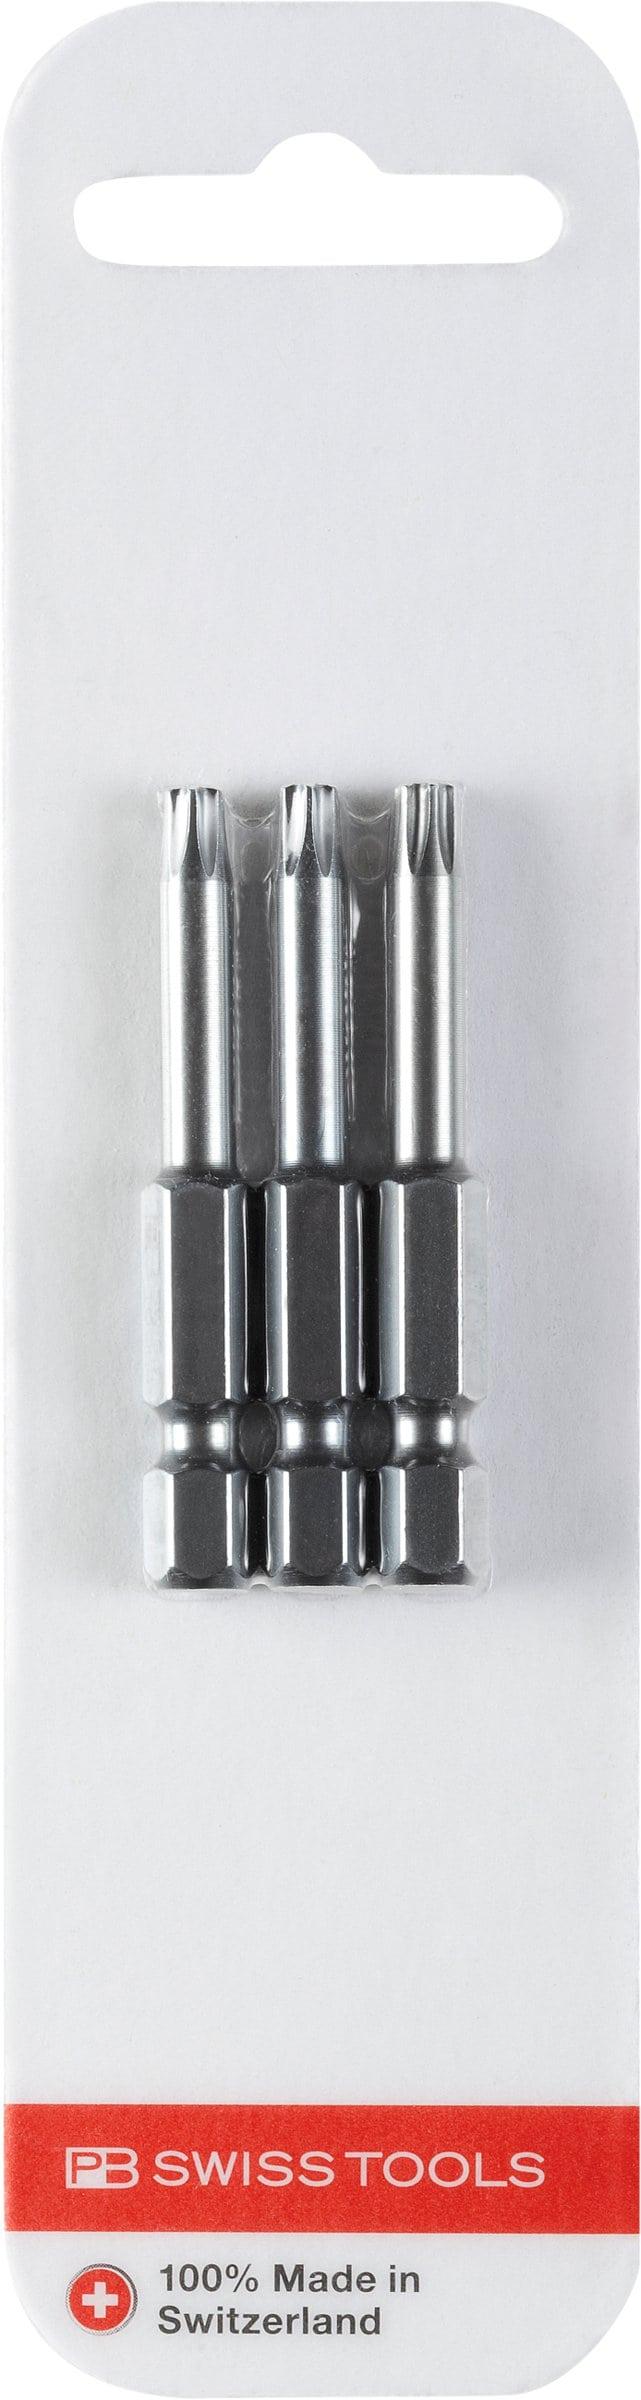 PB Swiss Tools Precision Bits E6-400